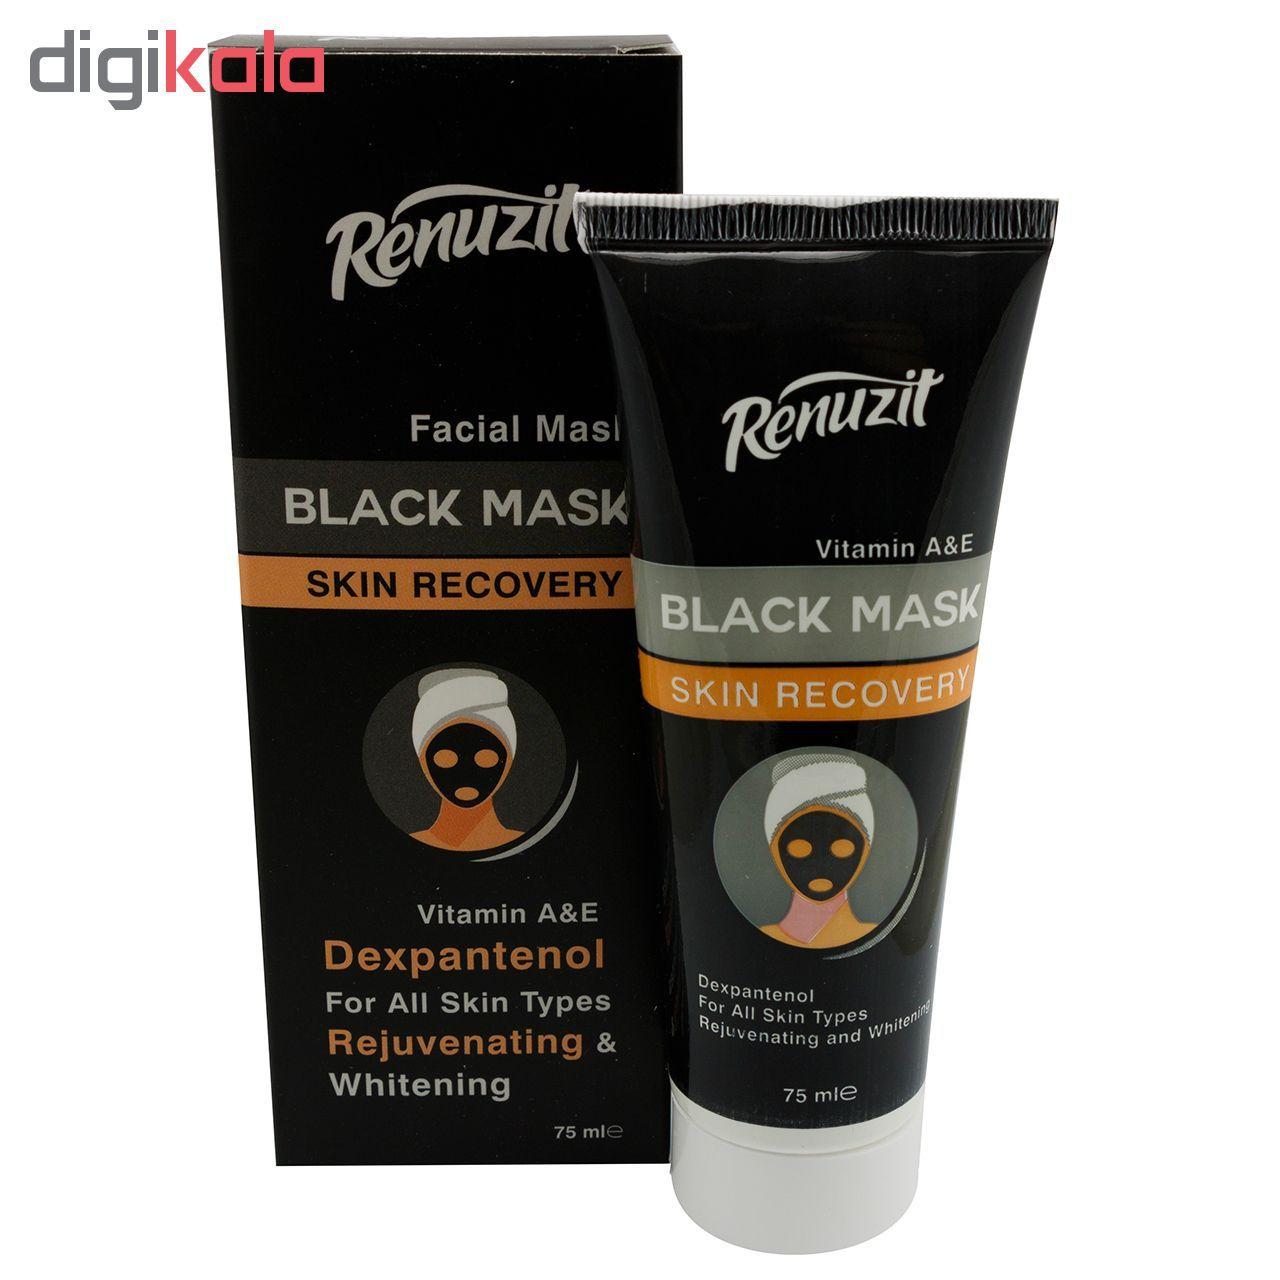 ماسک صورت رینو زیت مدل Black mask carbon active حجم 75 میلی لیتر مجموعه 2 عددی main 1 3